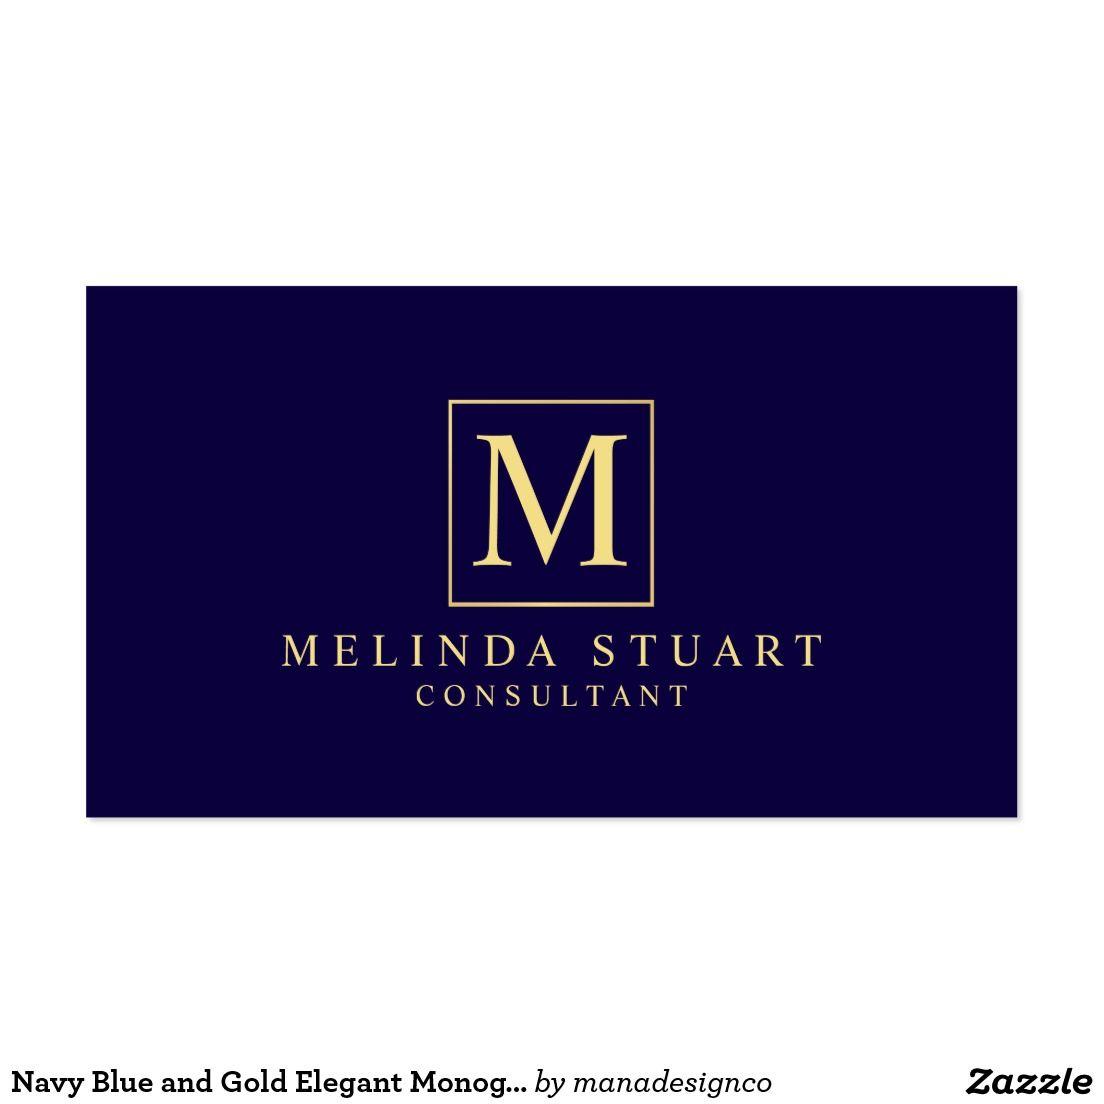 Navy Blue And Gold Elegant Monogram Business Card Template Perfect For A Makeup Artist Designe Luxury Business Cards Unique Business Cards Luxury Logo Design